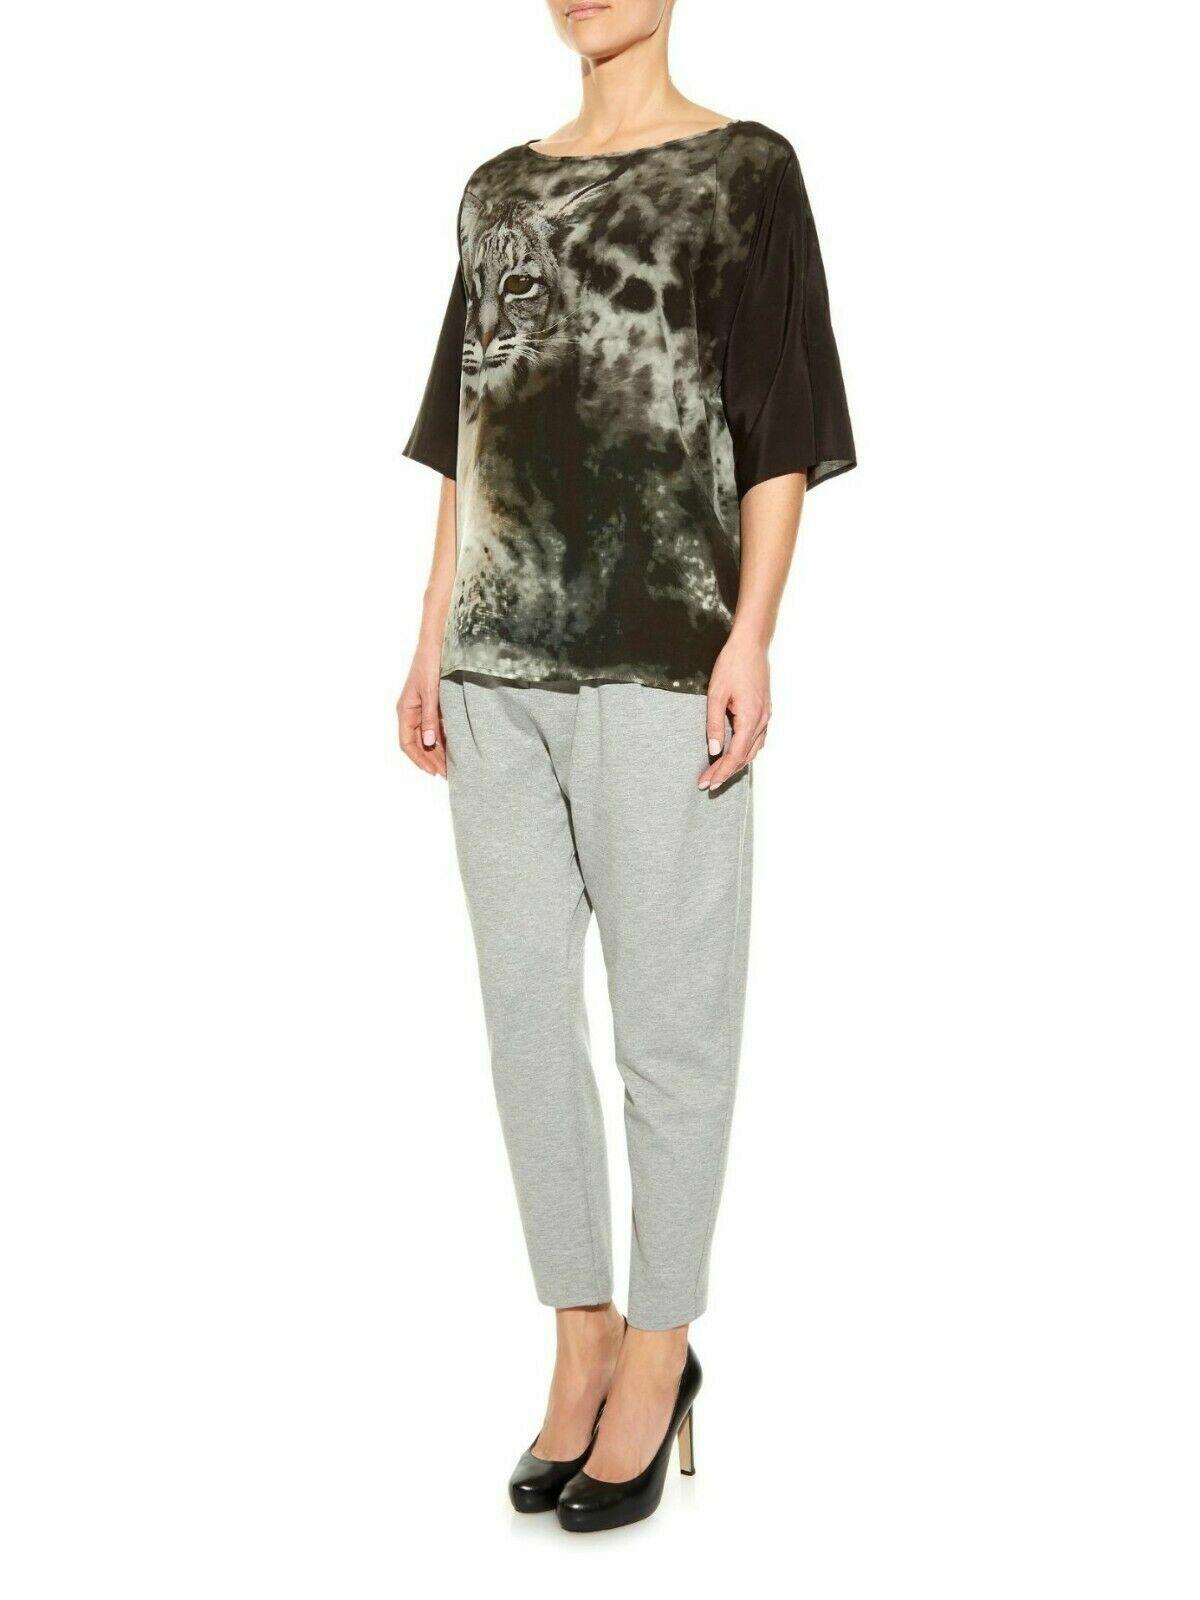 Max Mara damen Silk Top Villa Bobcat Print Shirt Blouse Short Sleeve S M  NW